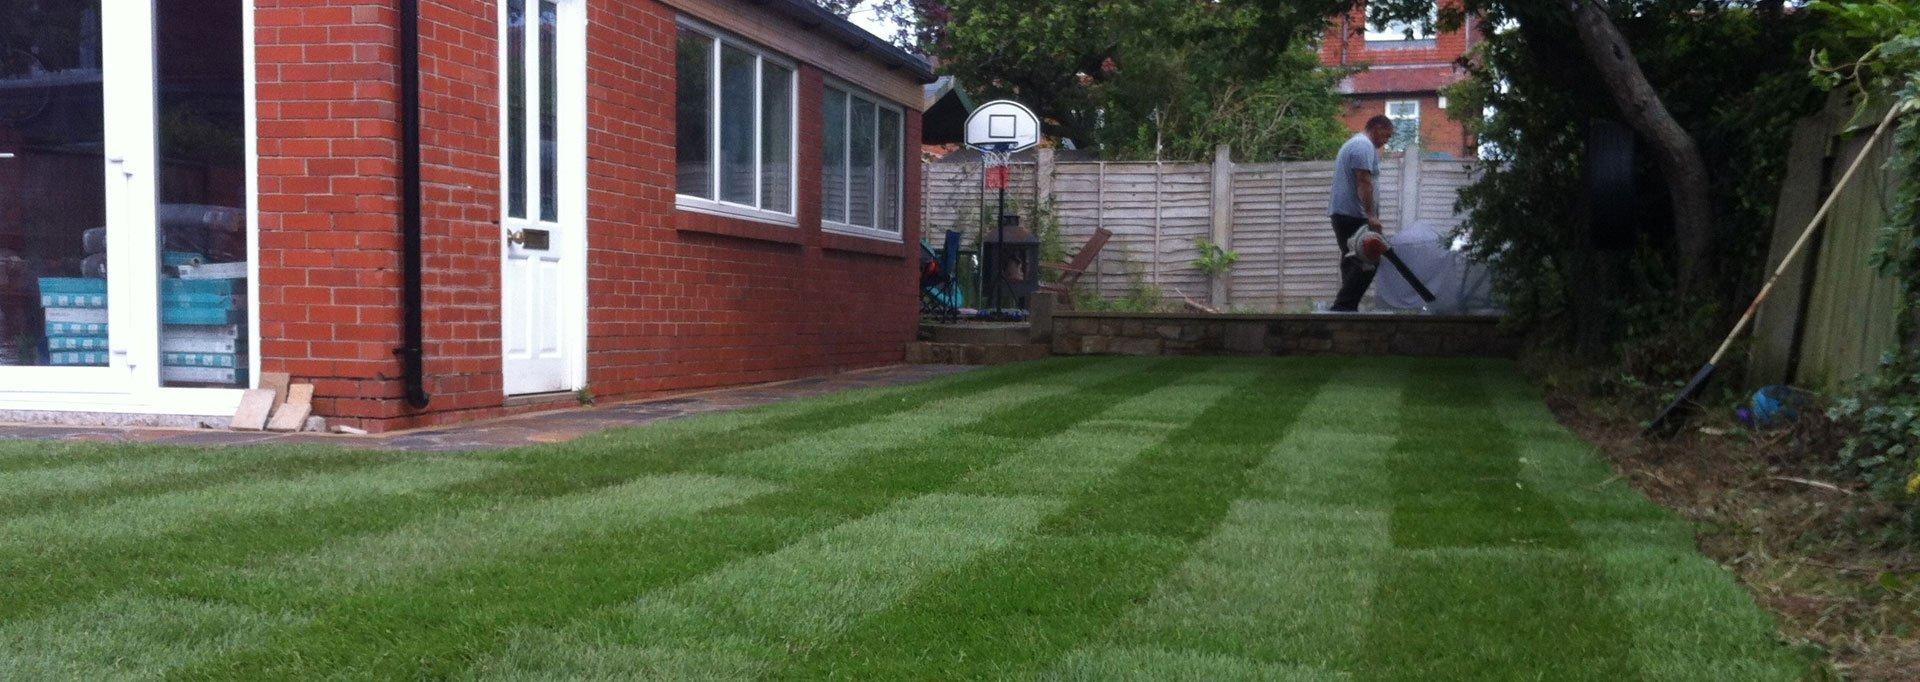 Garden maintenance and renovation